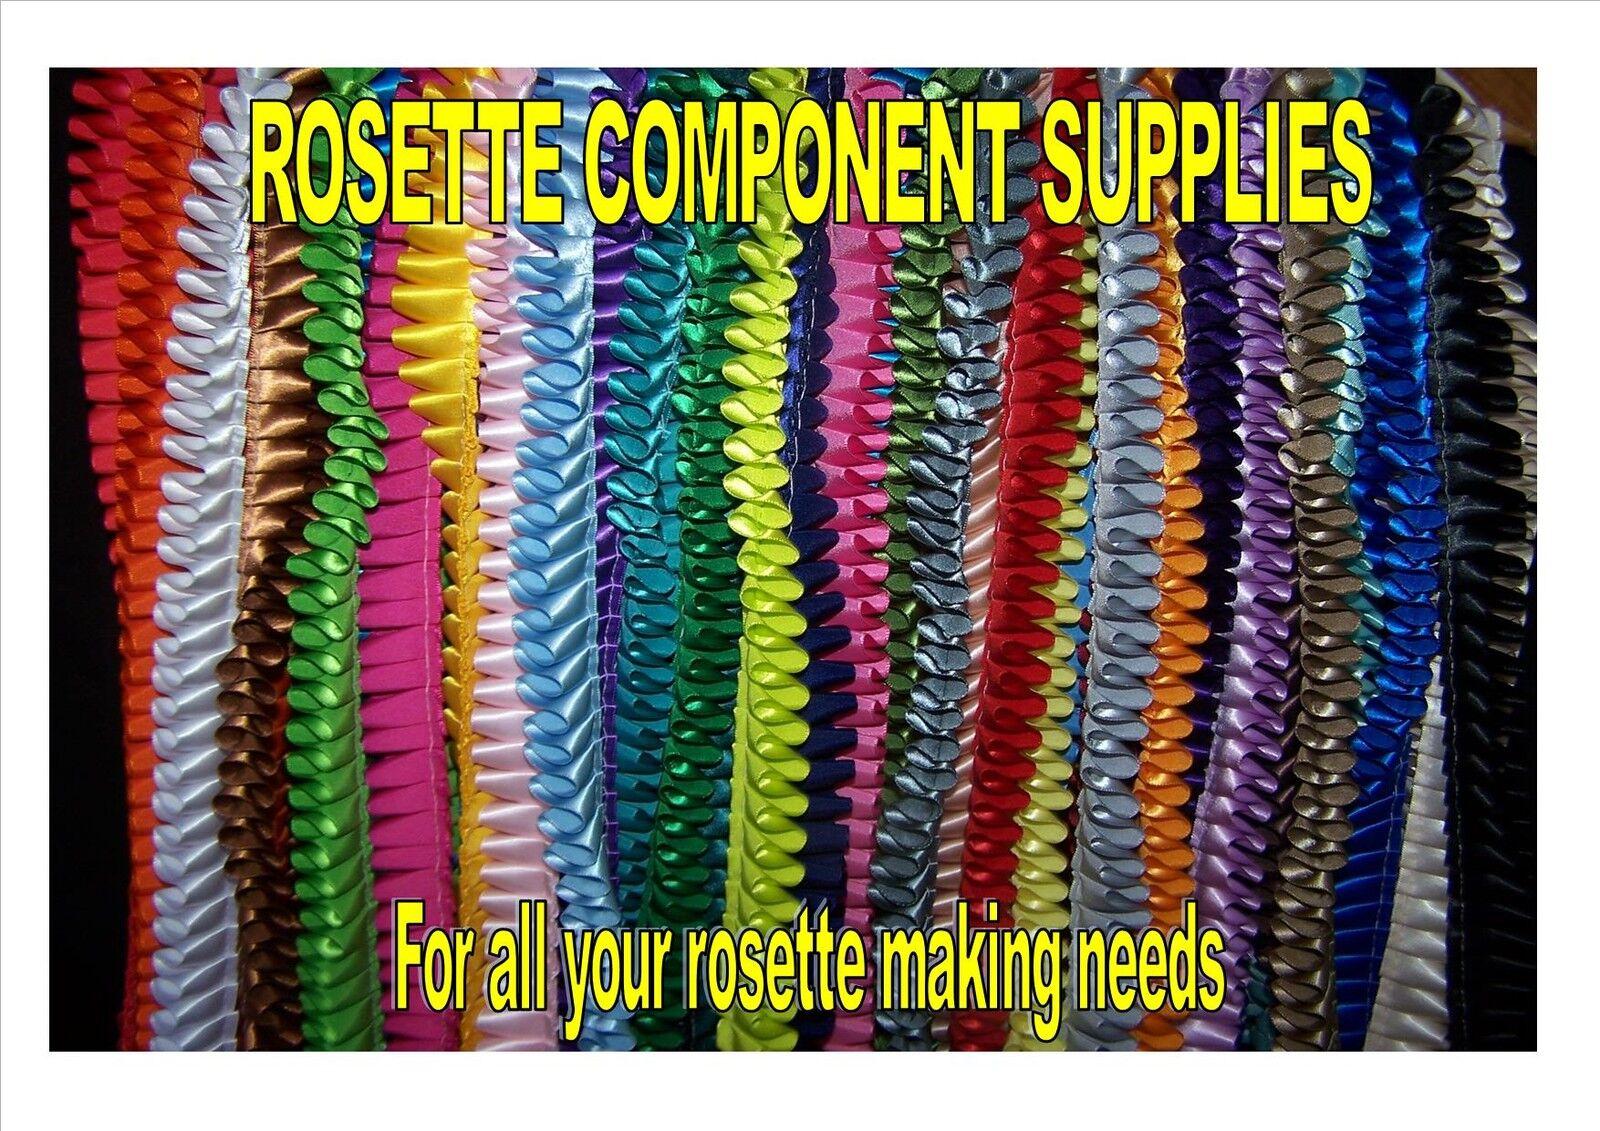 Rosette Component Supplies